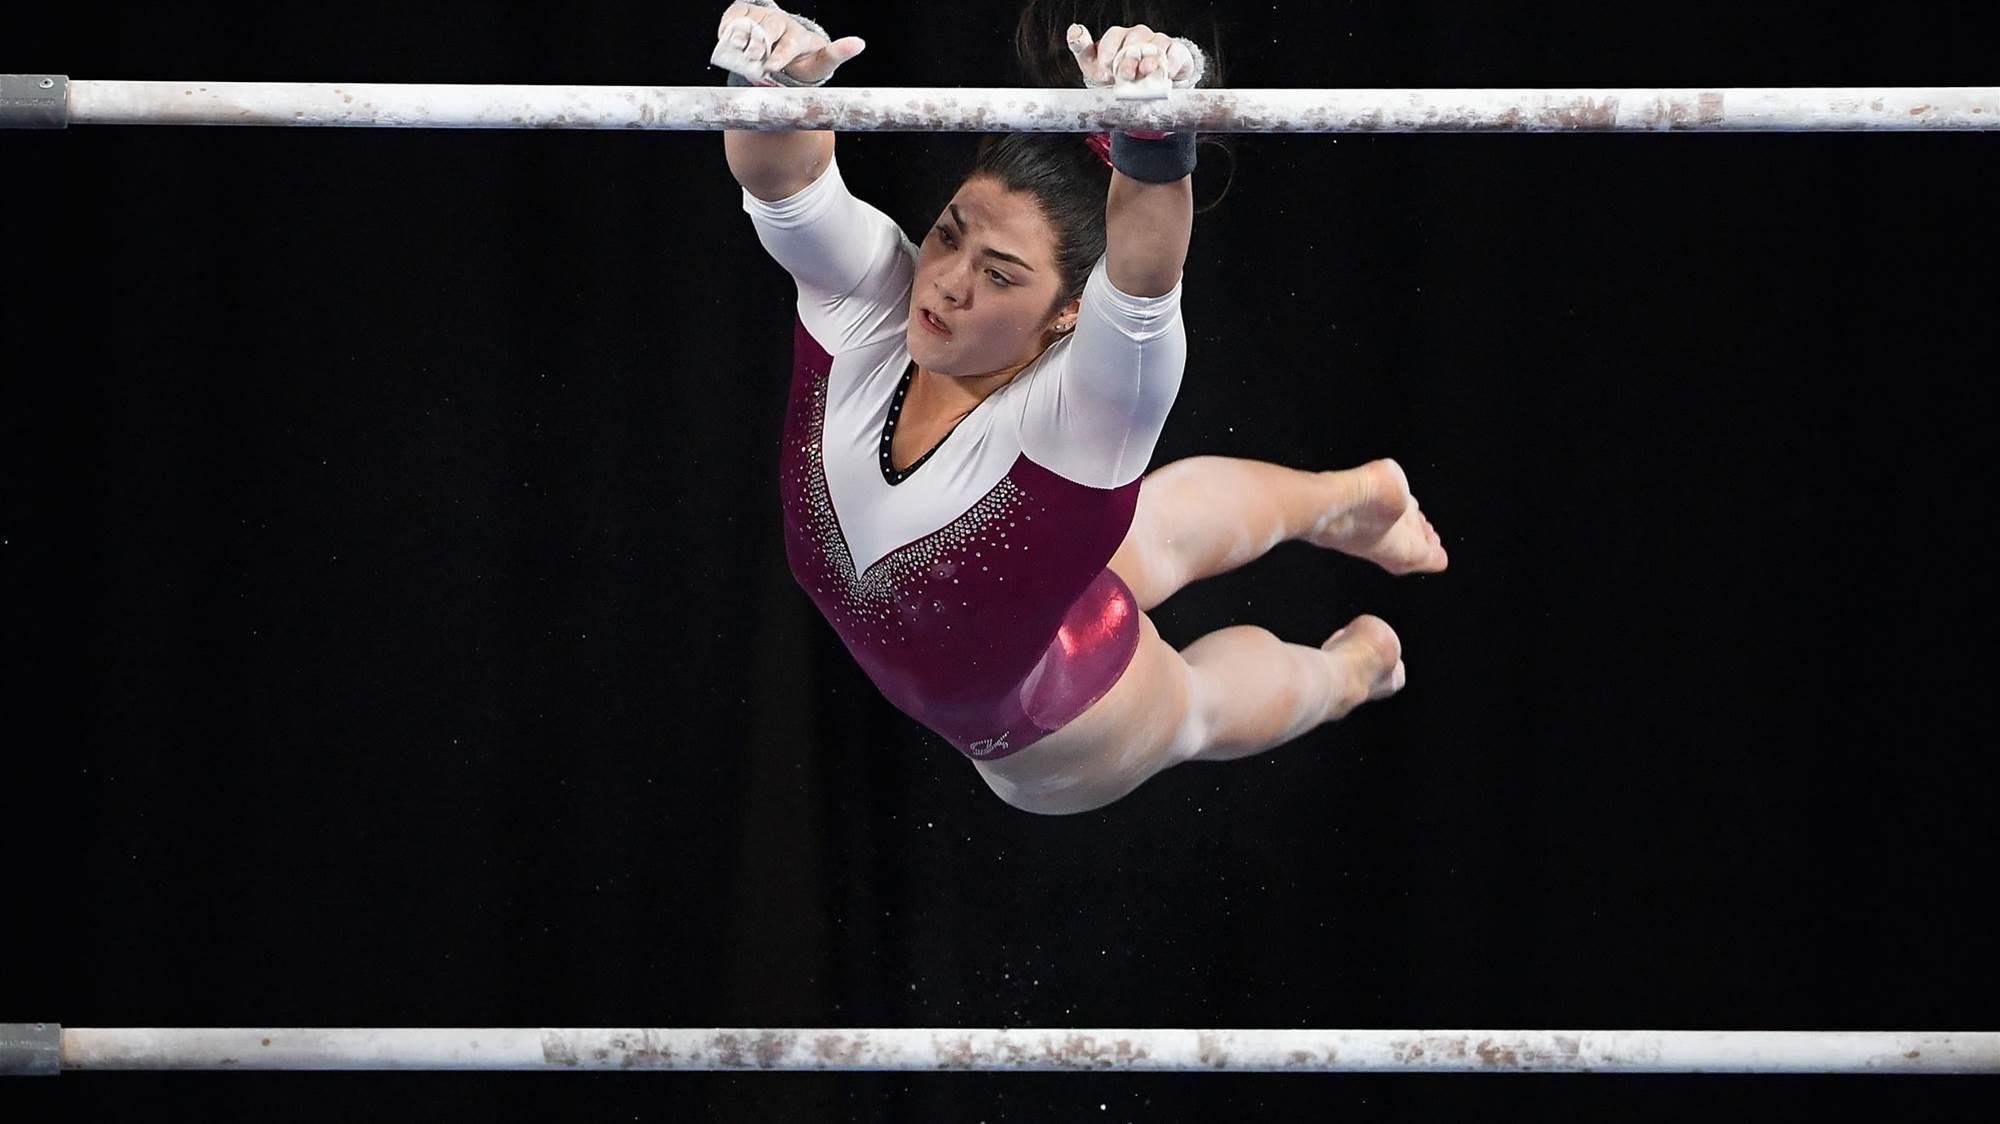 Godwin dominates at Gymnastics Championships